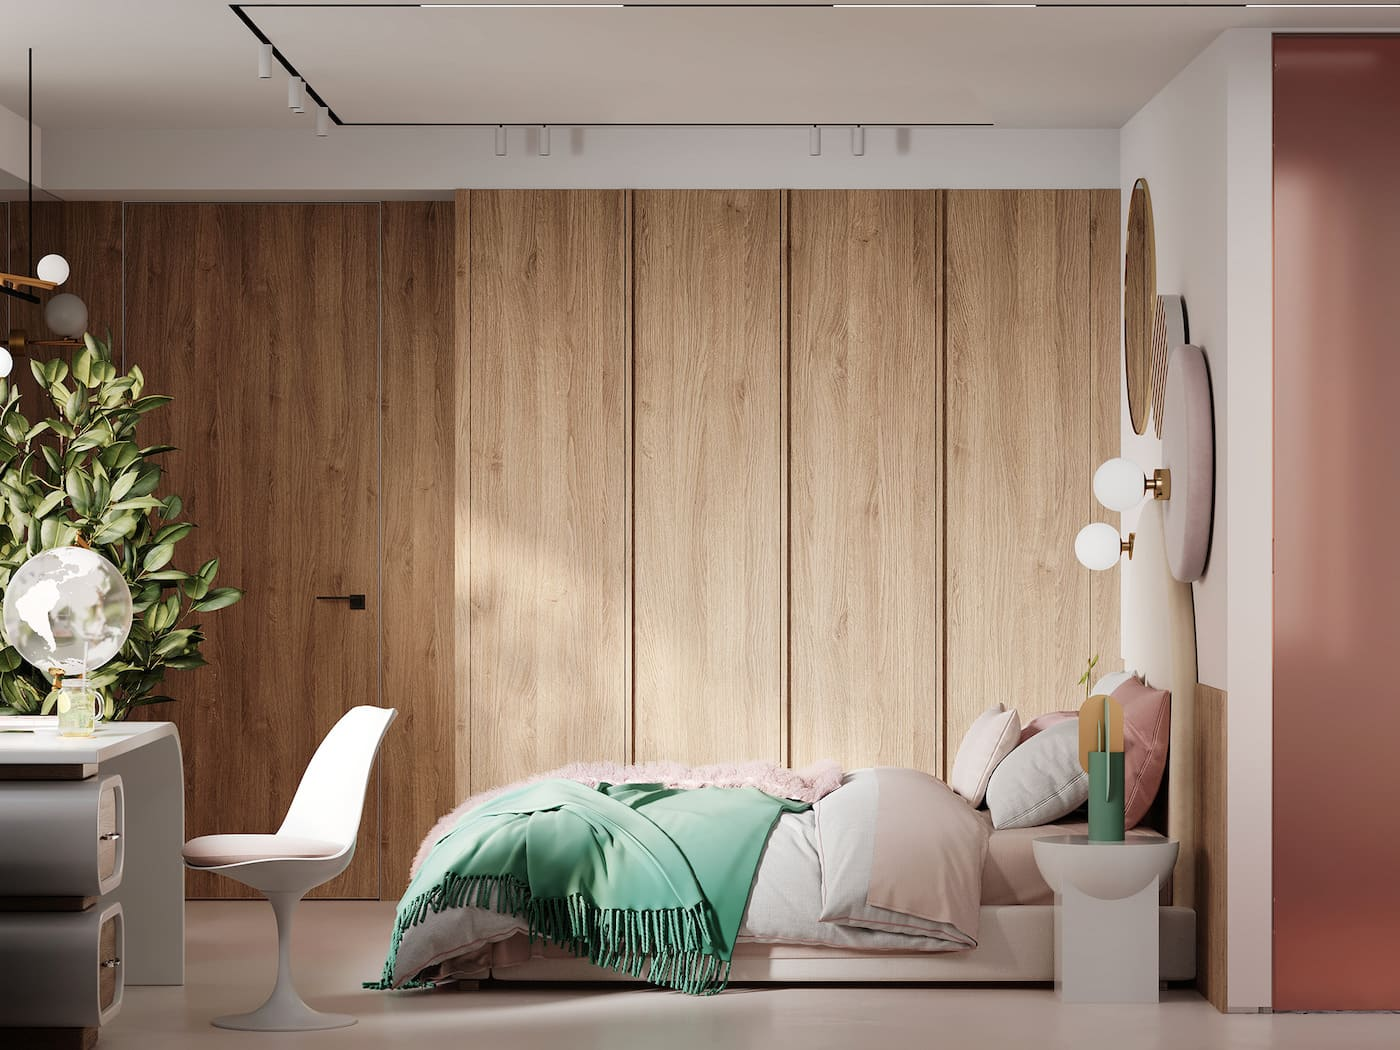 дизайн интерьера модной квартиры фото 101